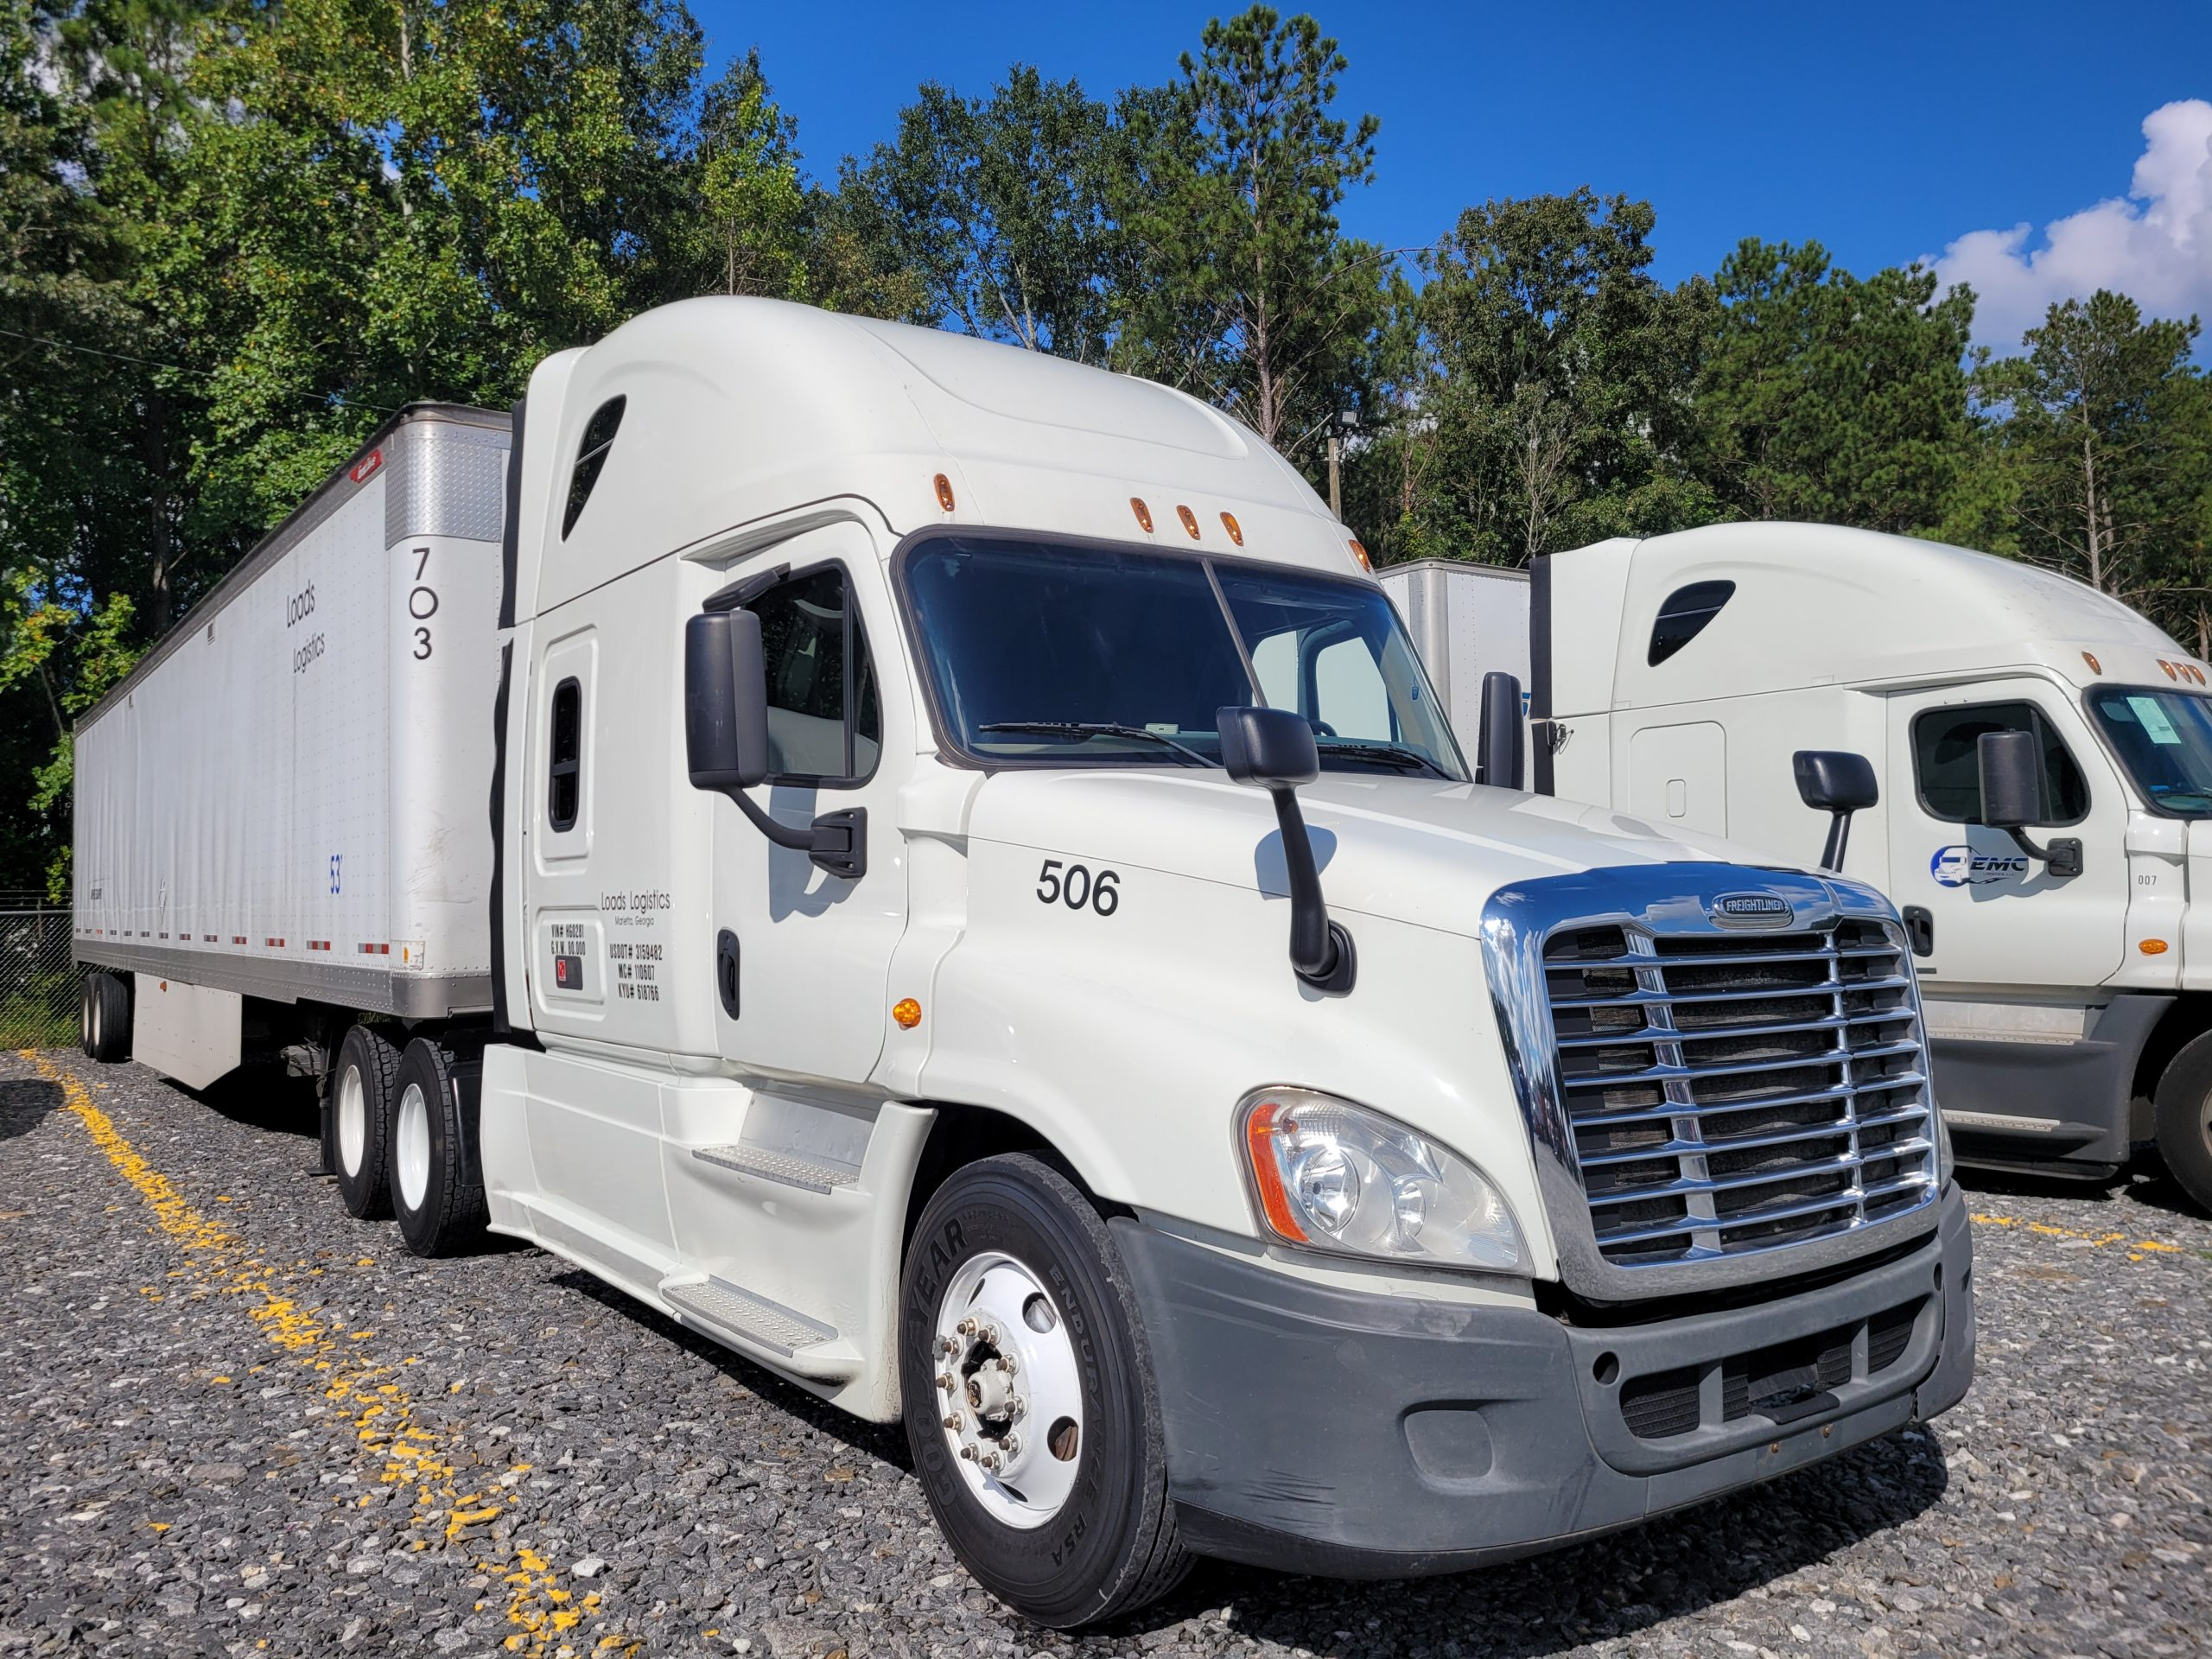 Truck 506